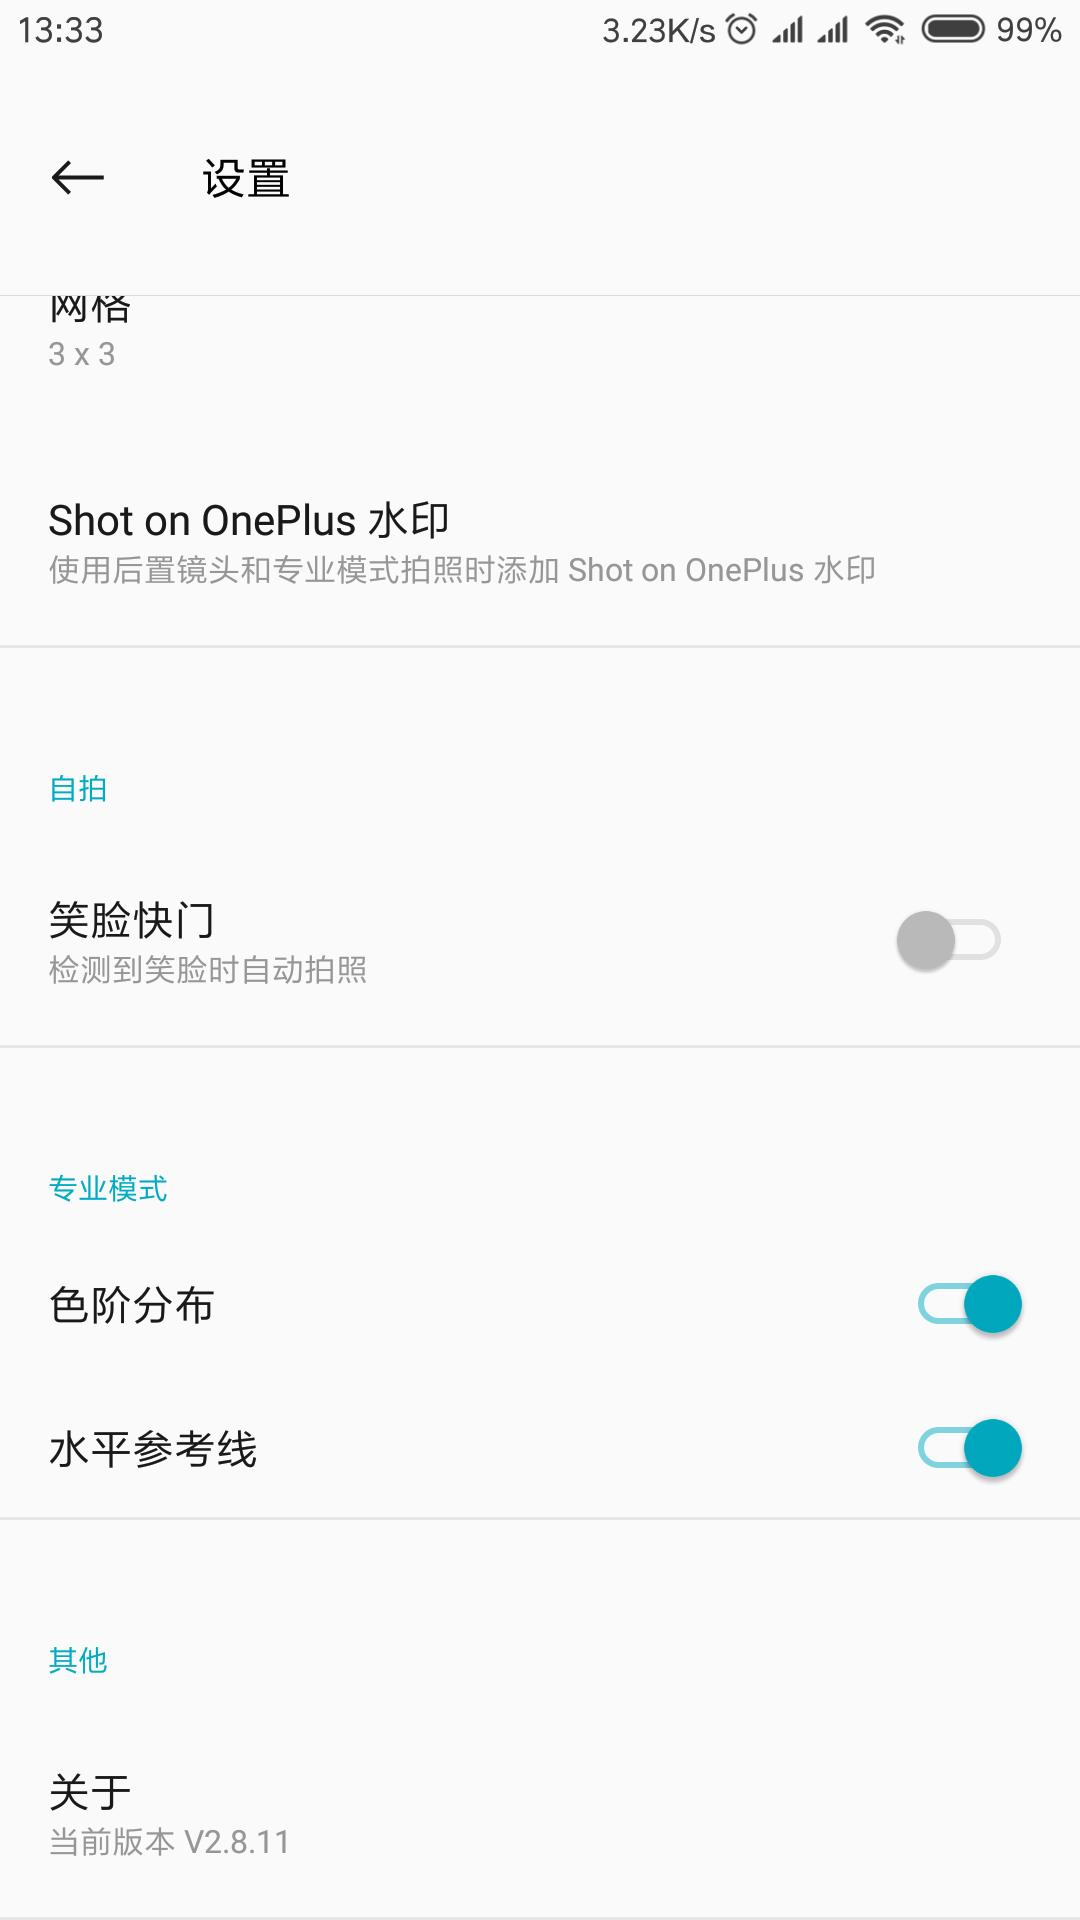 Screenshot_2018-08-02-13-33-50-510_com.oneplus.ca.png